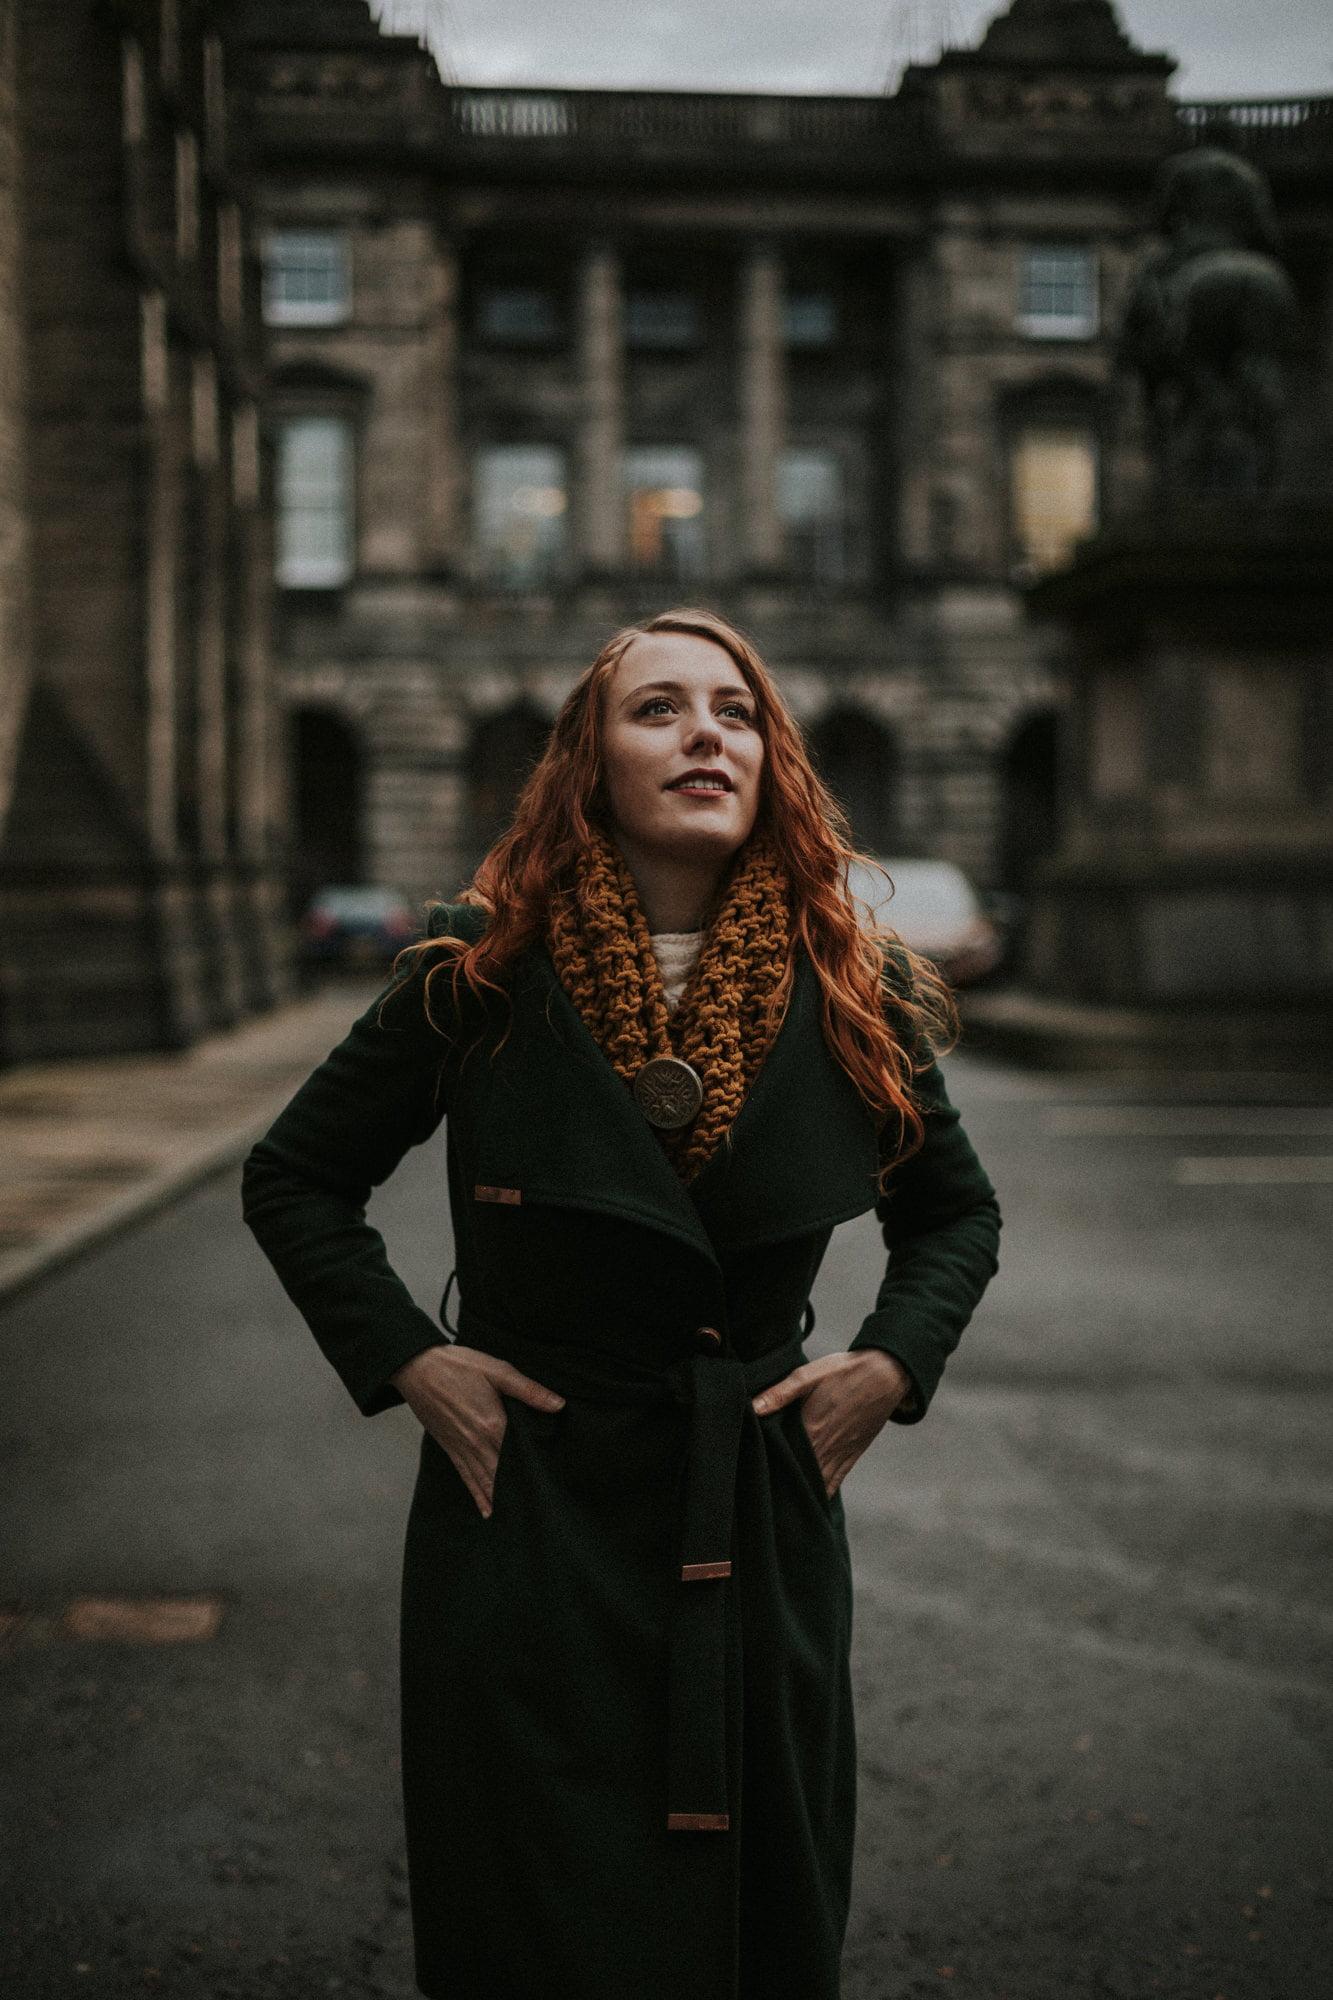 Winter portrait photoshoot in Edinburgh